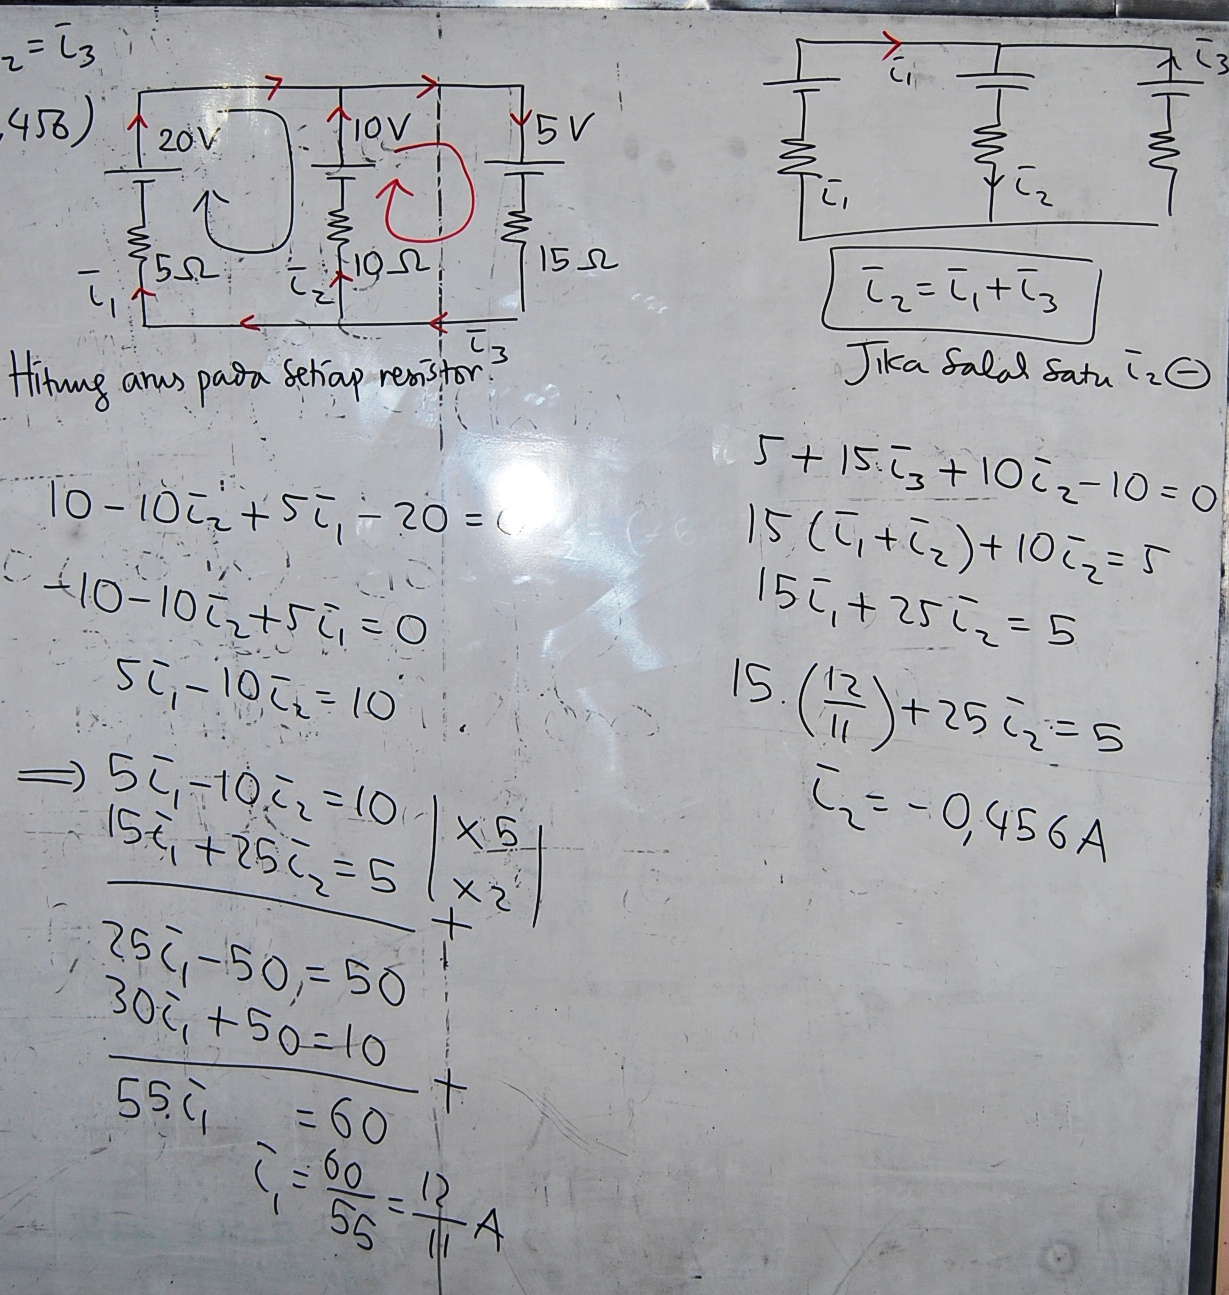 contoh resume x contoh resume 1024 x 765 196 kb jpeg